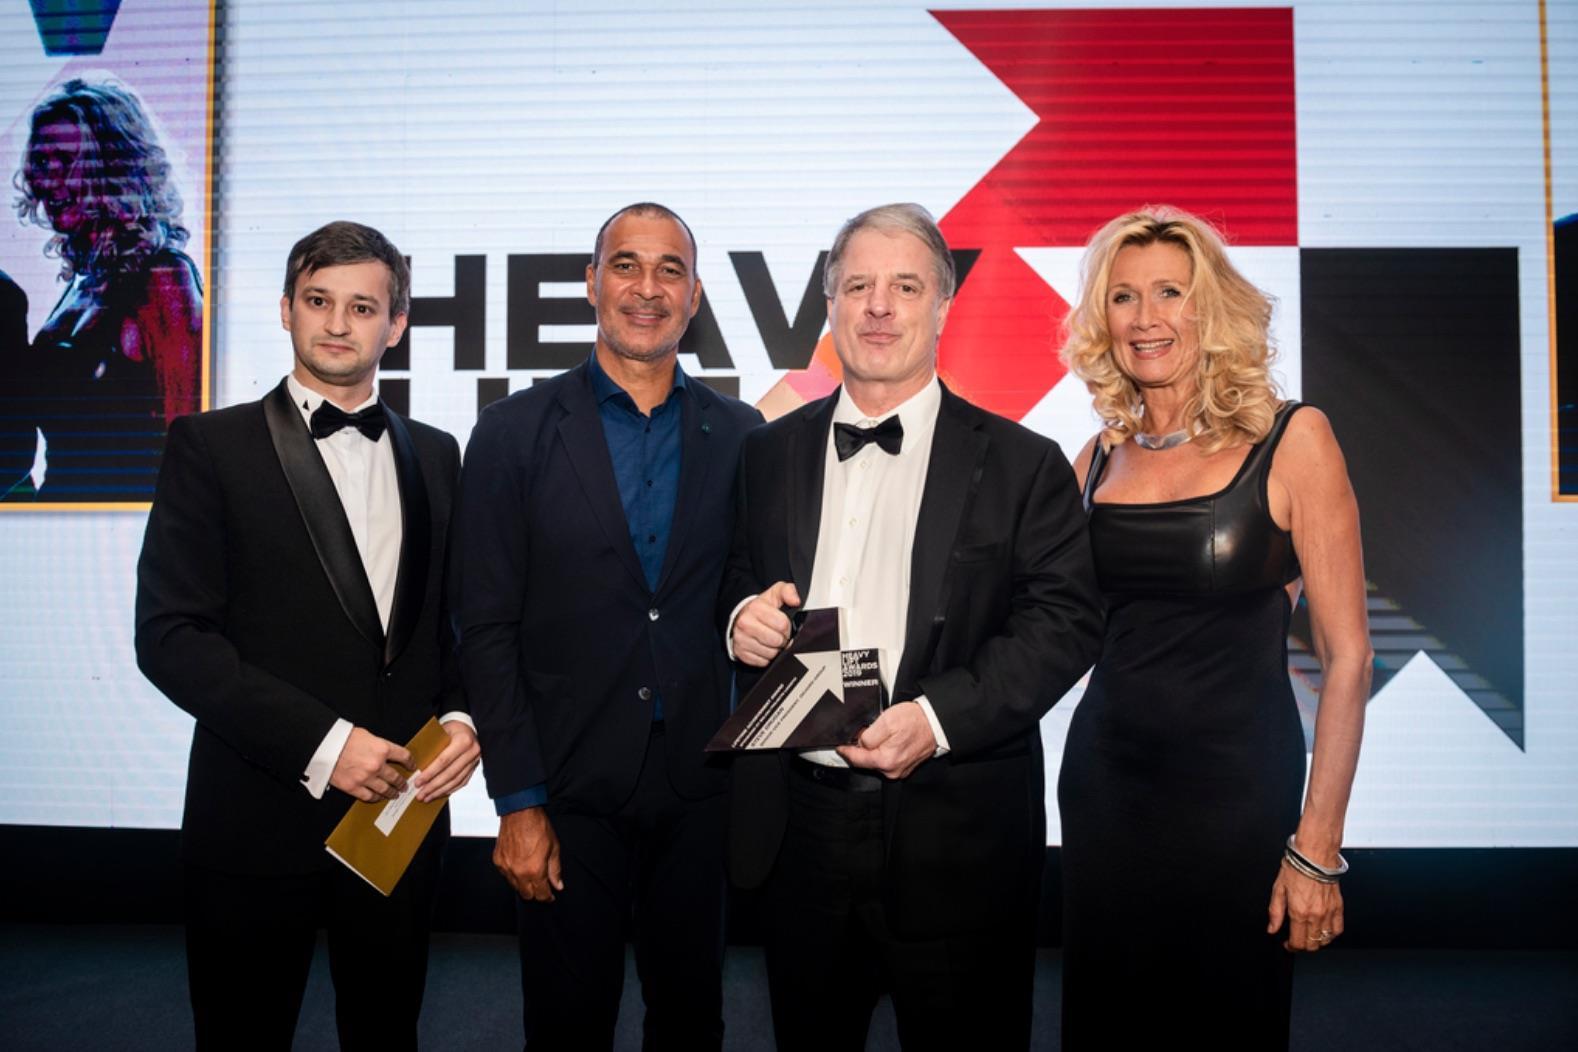 HLPFIwas proud to present Steve Drugan, senior vice president of deugro group, with our Lifetime Achievement Award.